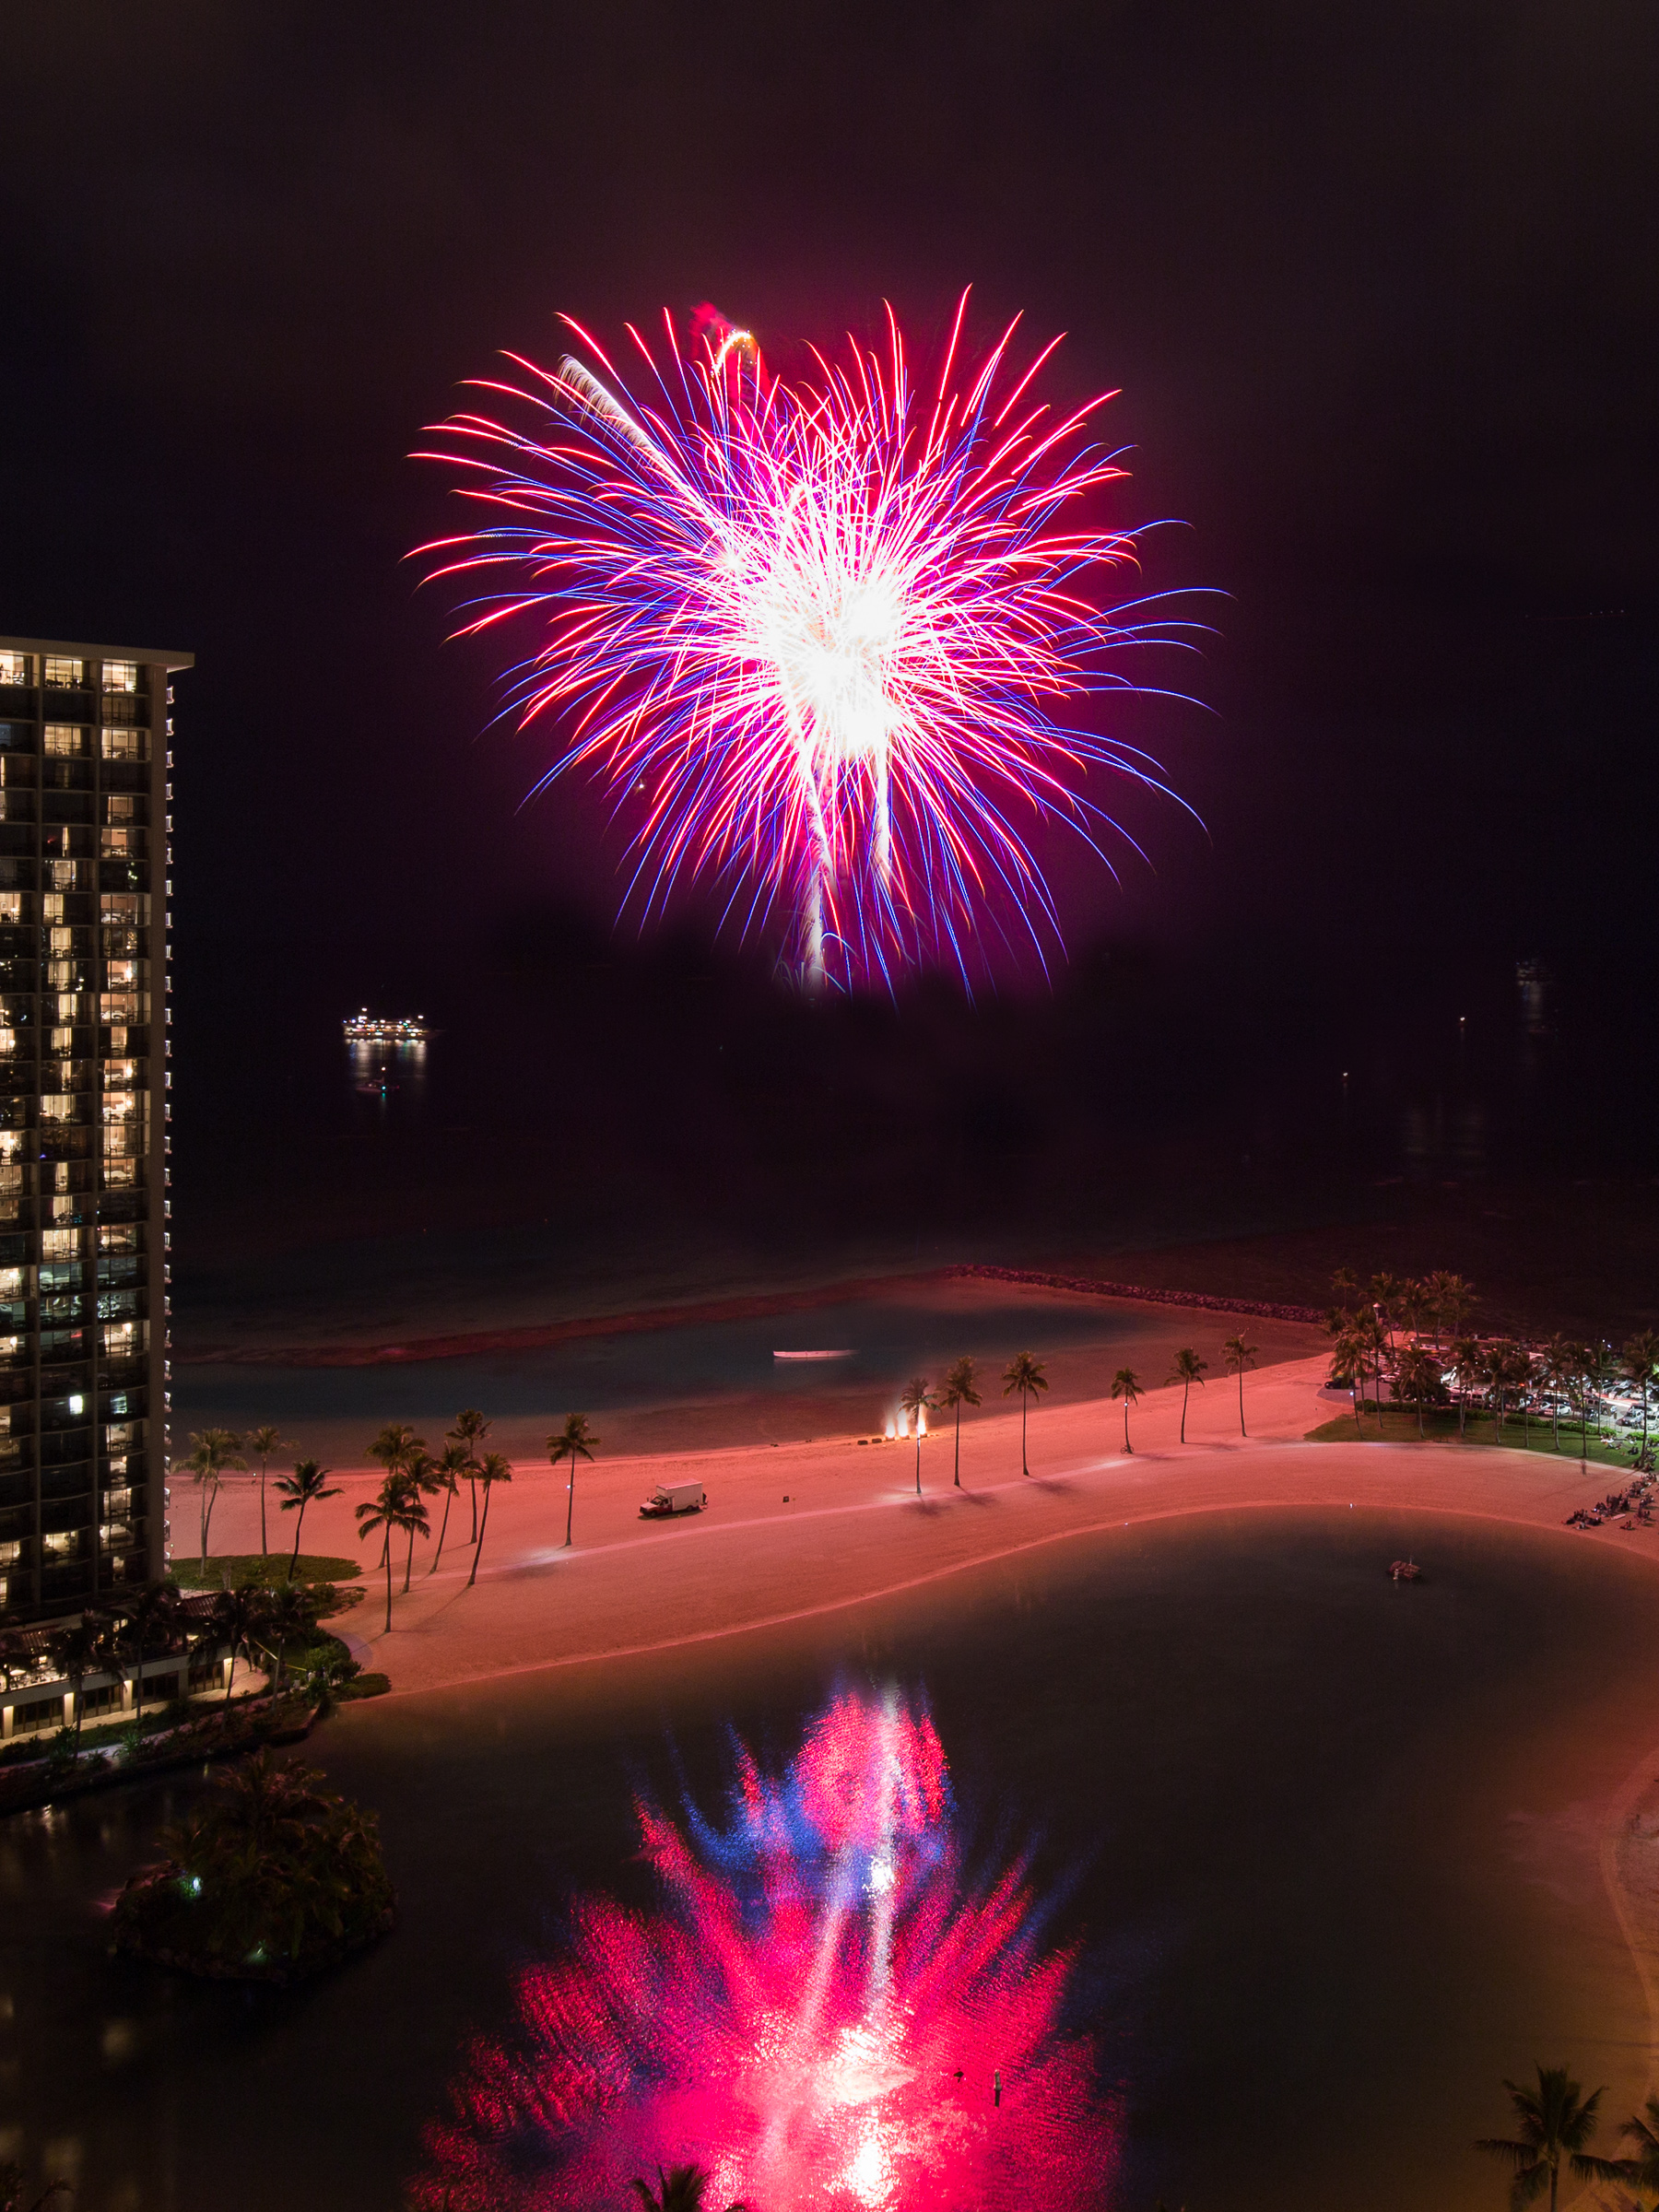 Fireworks light up the night outside the Ilikai on Waikiki beach